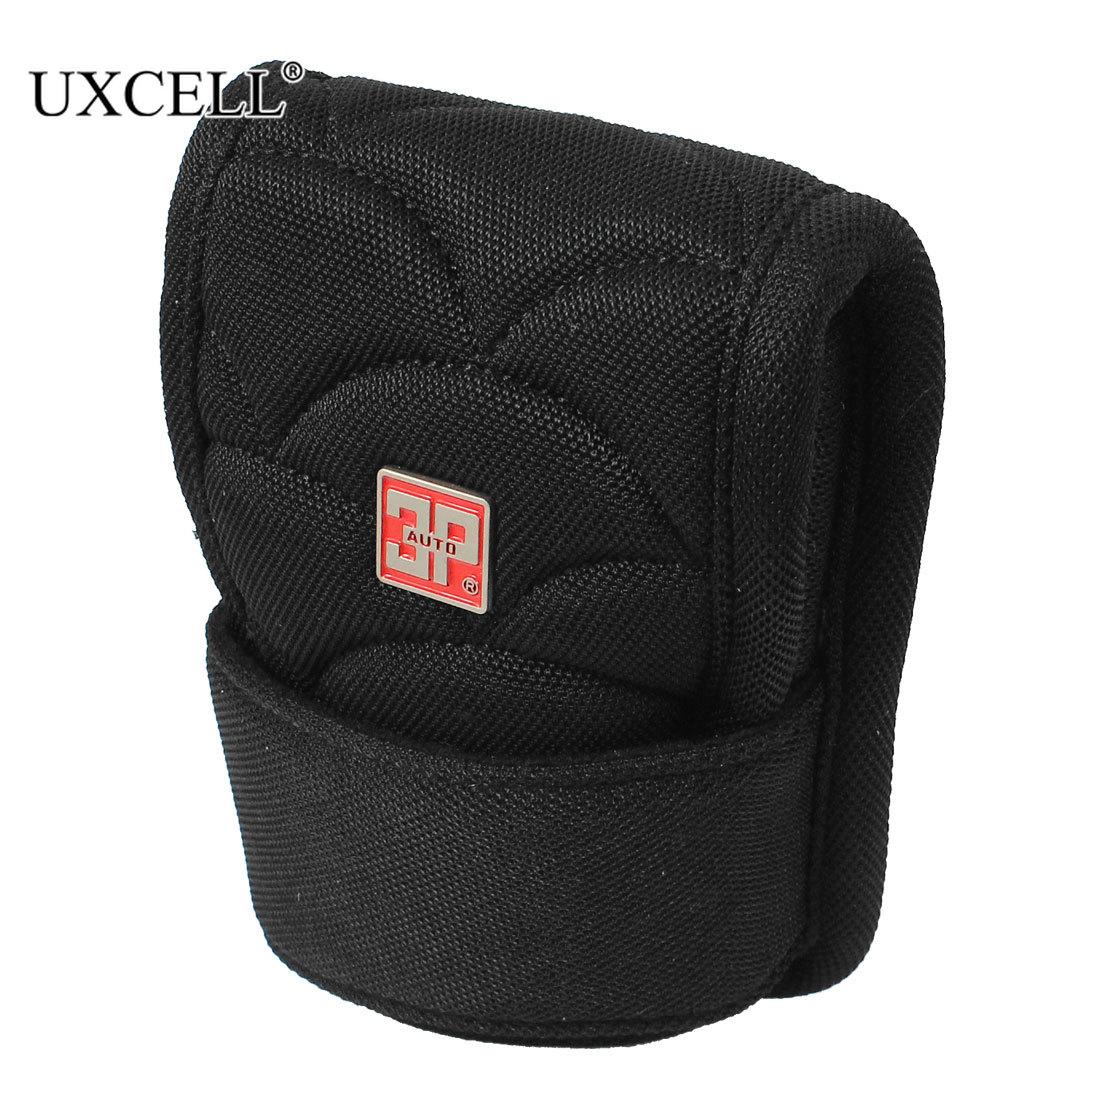 Uxcell Universal Car Hook Loop Closure Gear Shift Knob Boot Nylon Cover Protector Black Gear Shift Collars